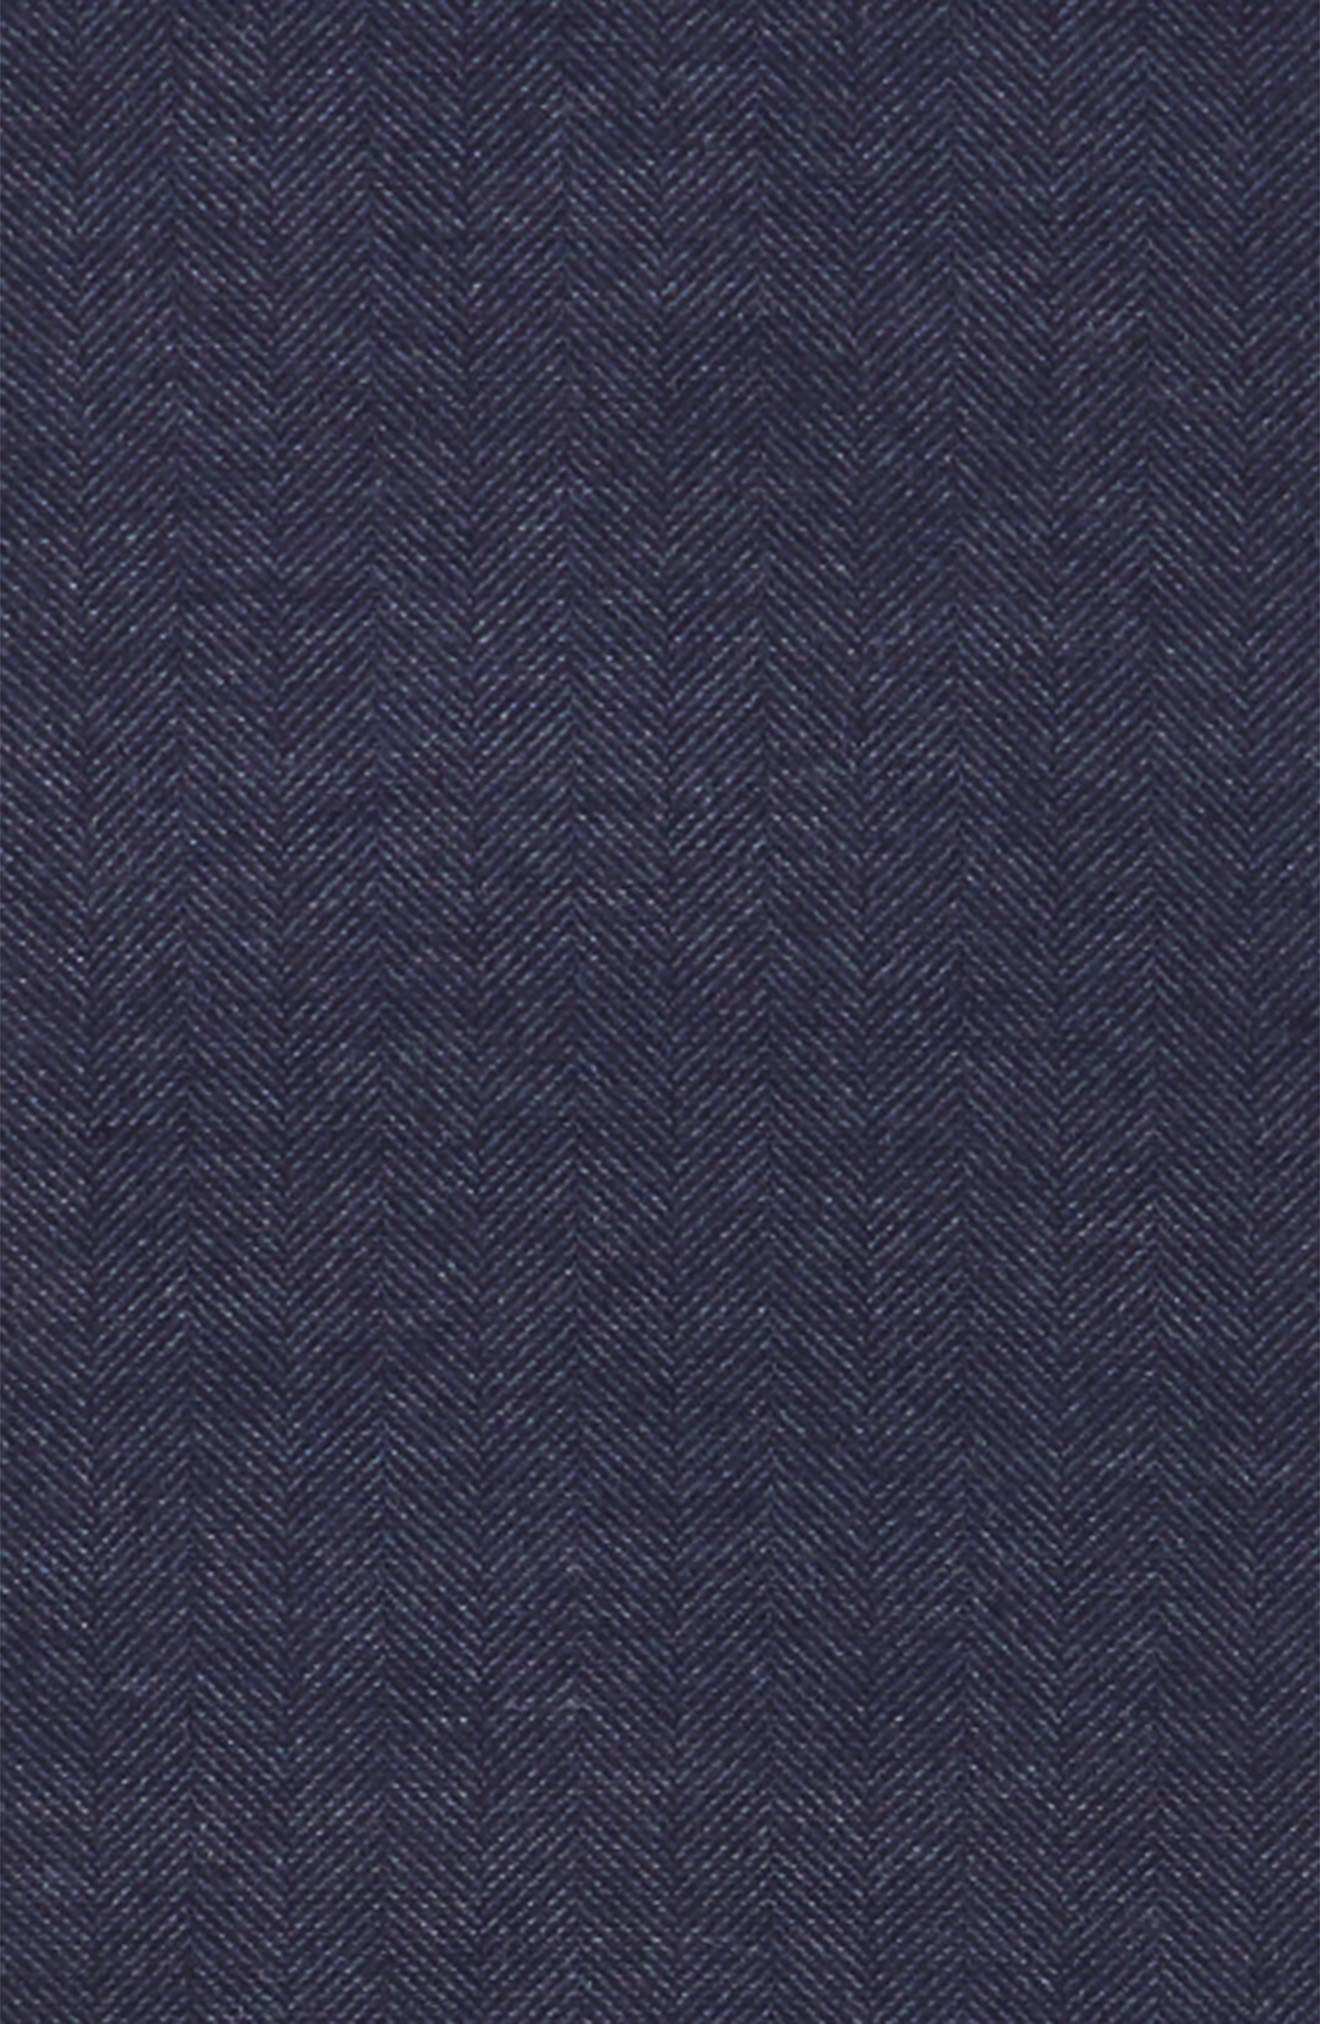 Alternate Image 3  - Nordstrom Men's Shop Herringbone Silk Blend Scarf